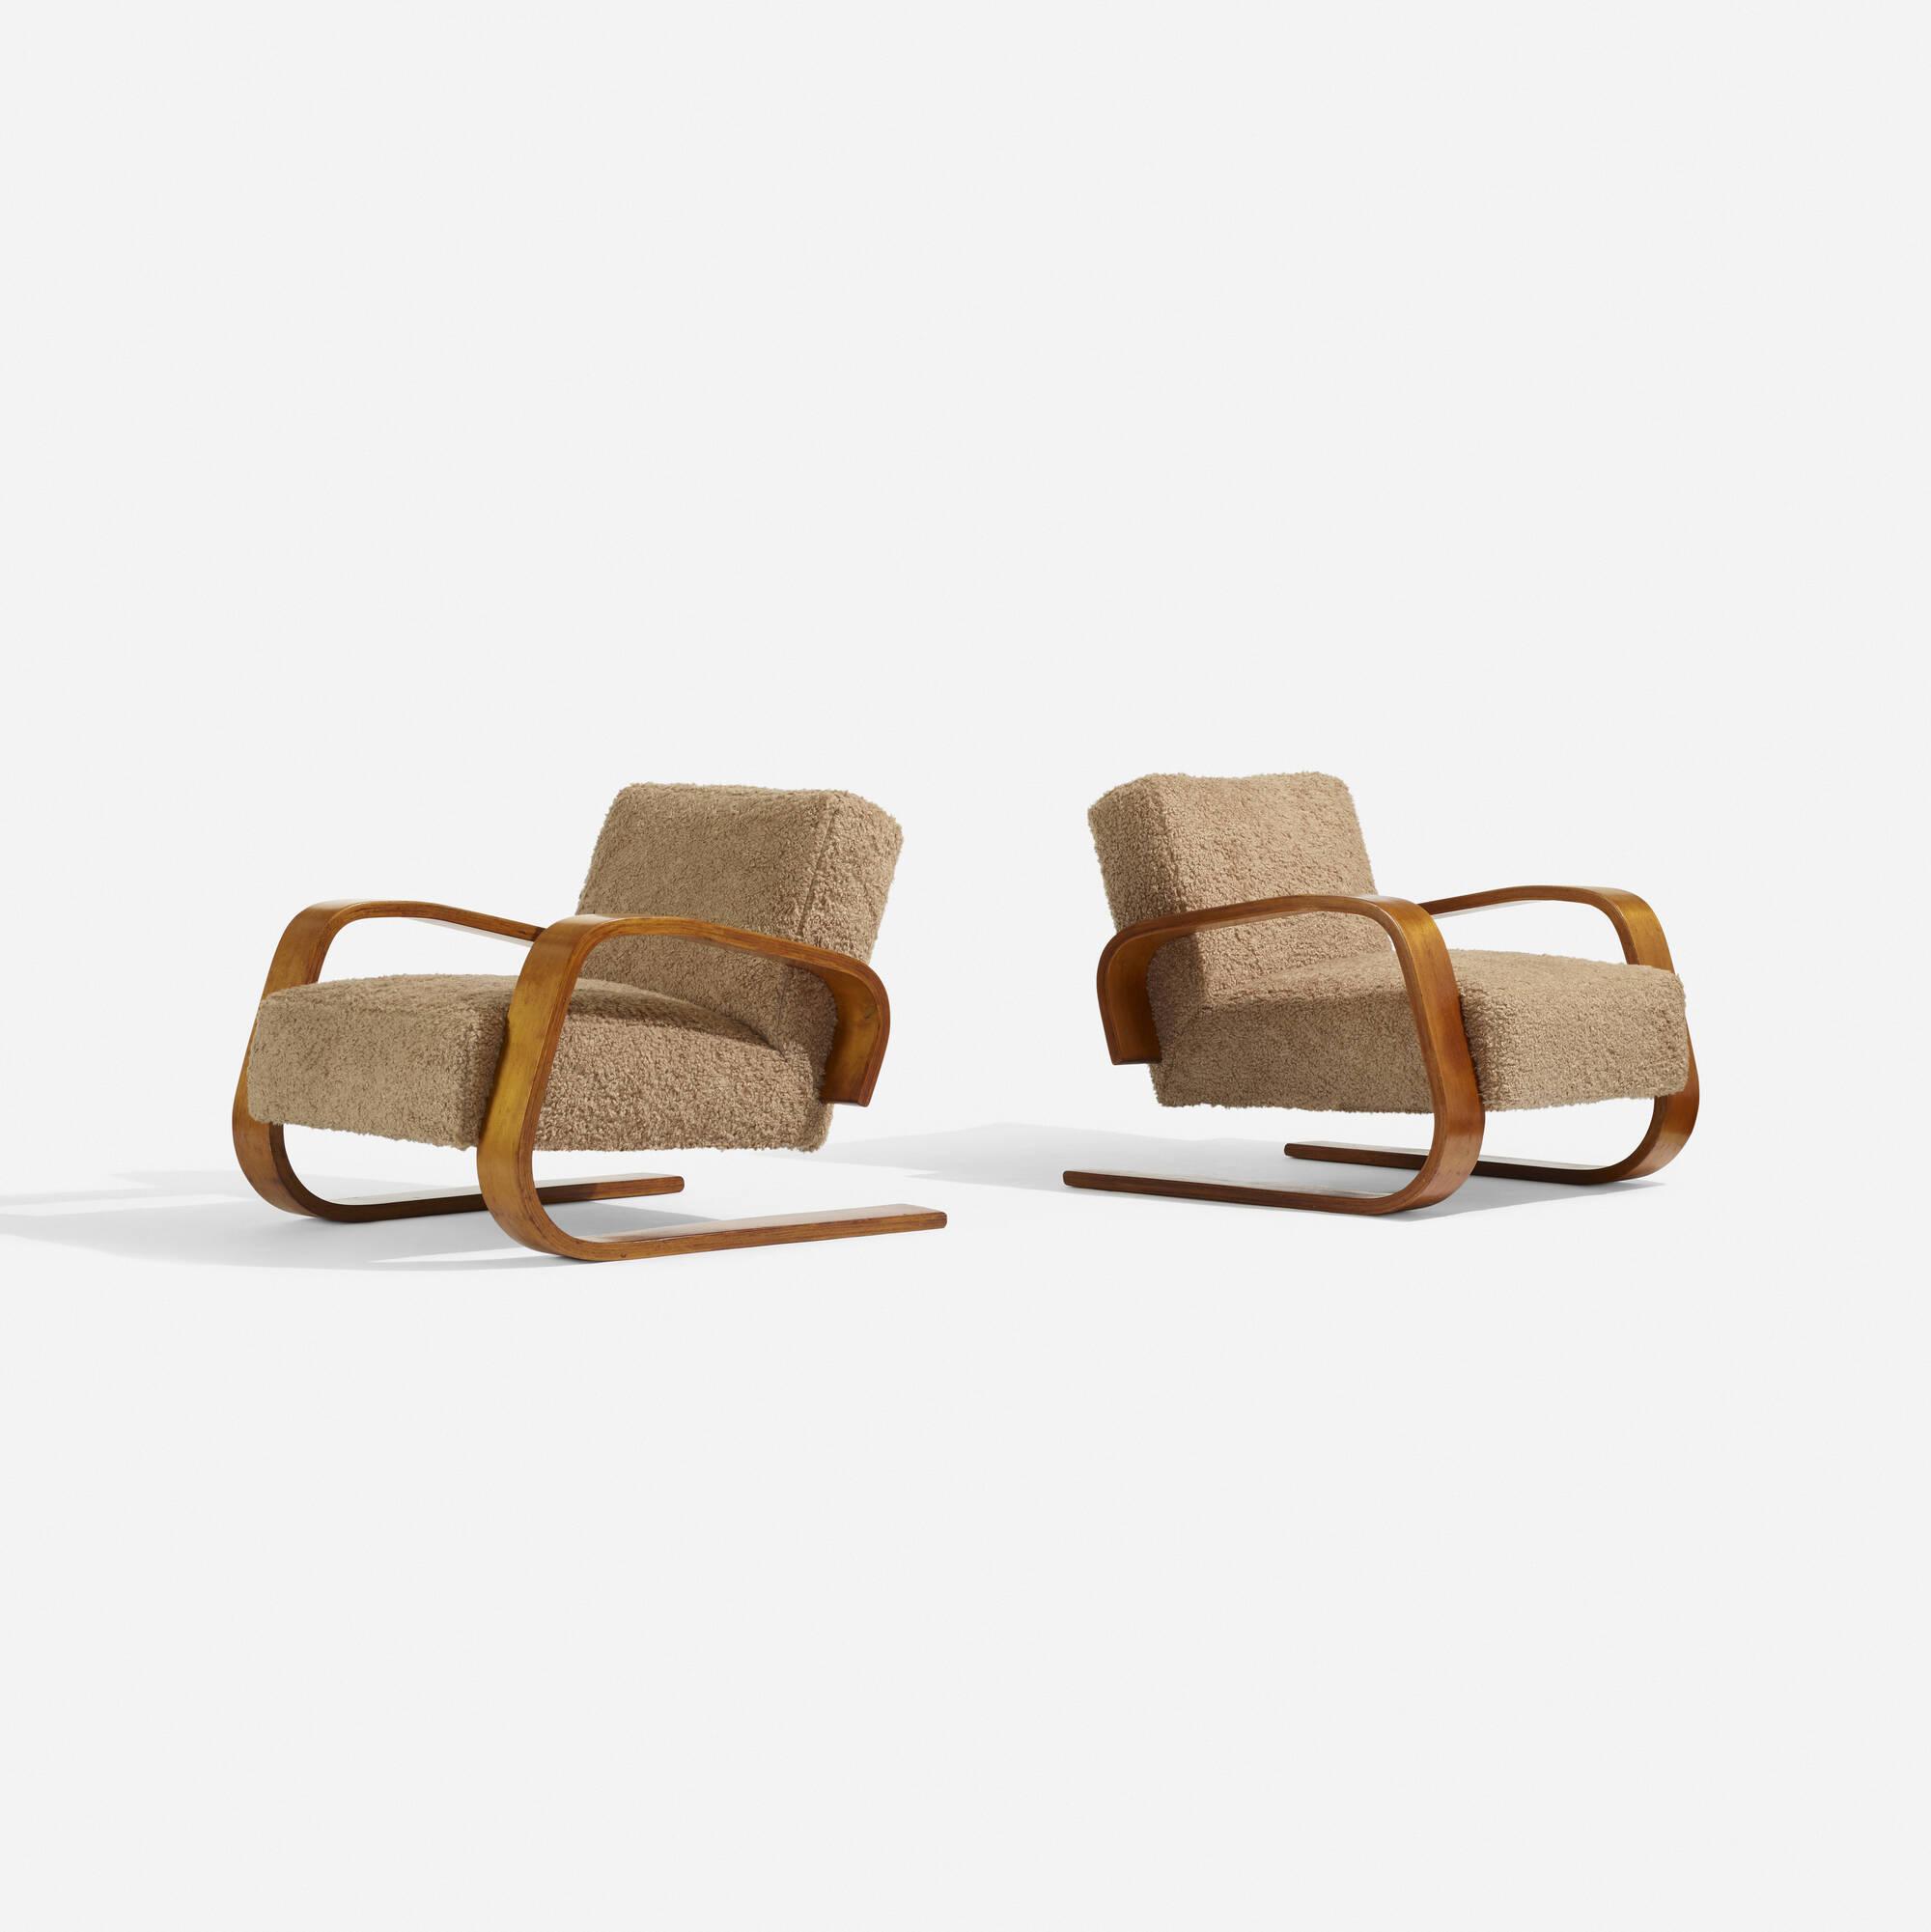 107: Alvar Aalto / Tank lounge chairs model 37/400, pair (2 of 3)